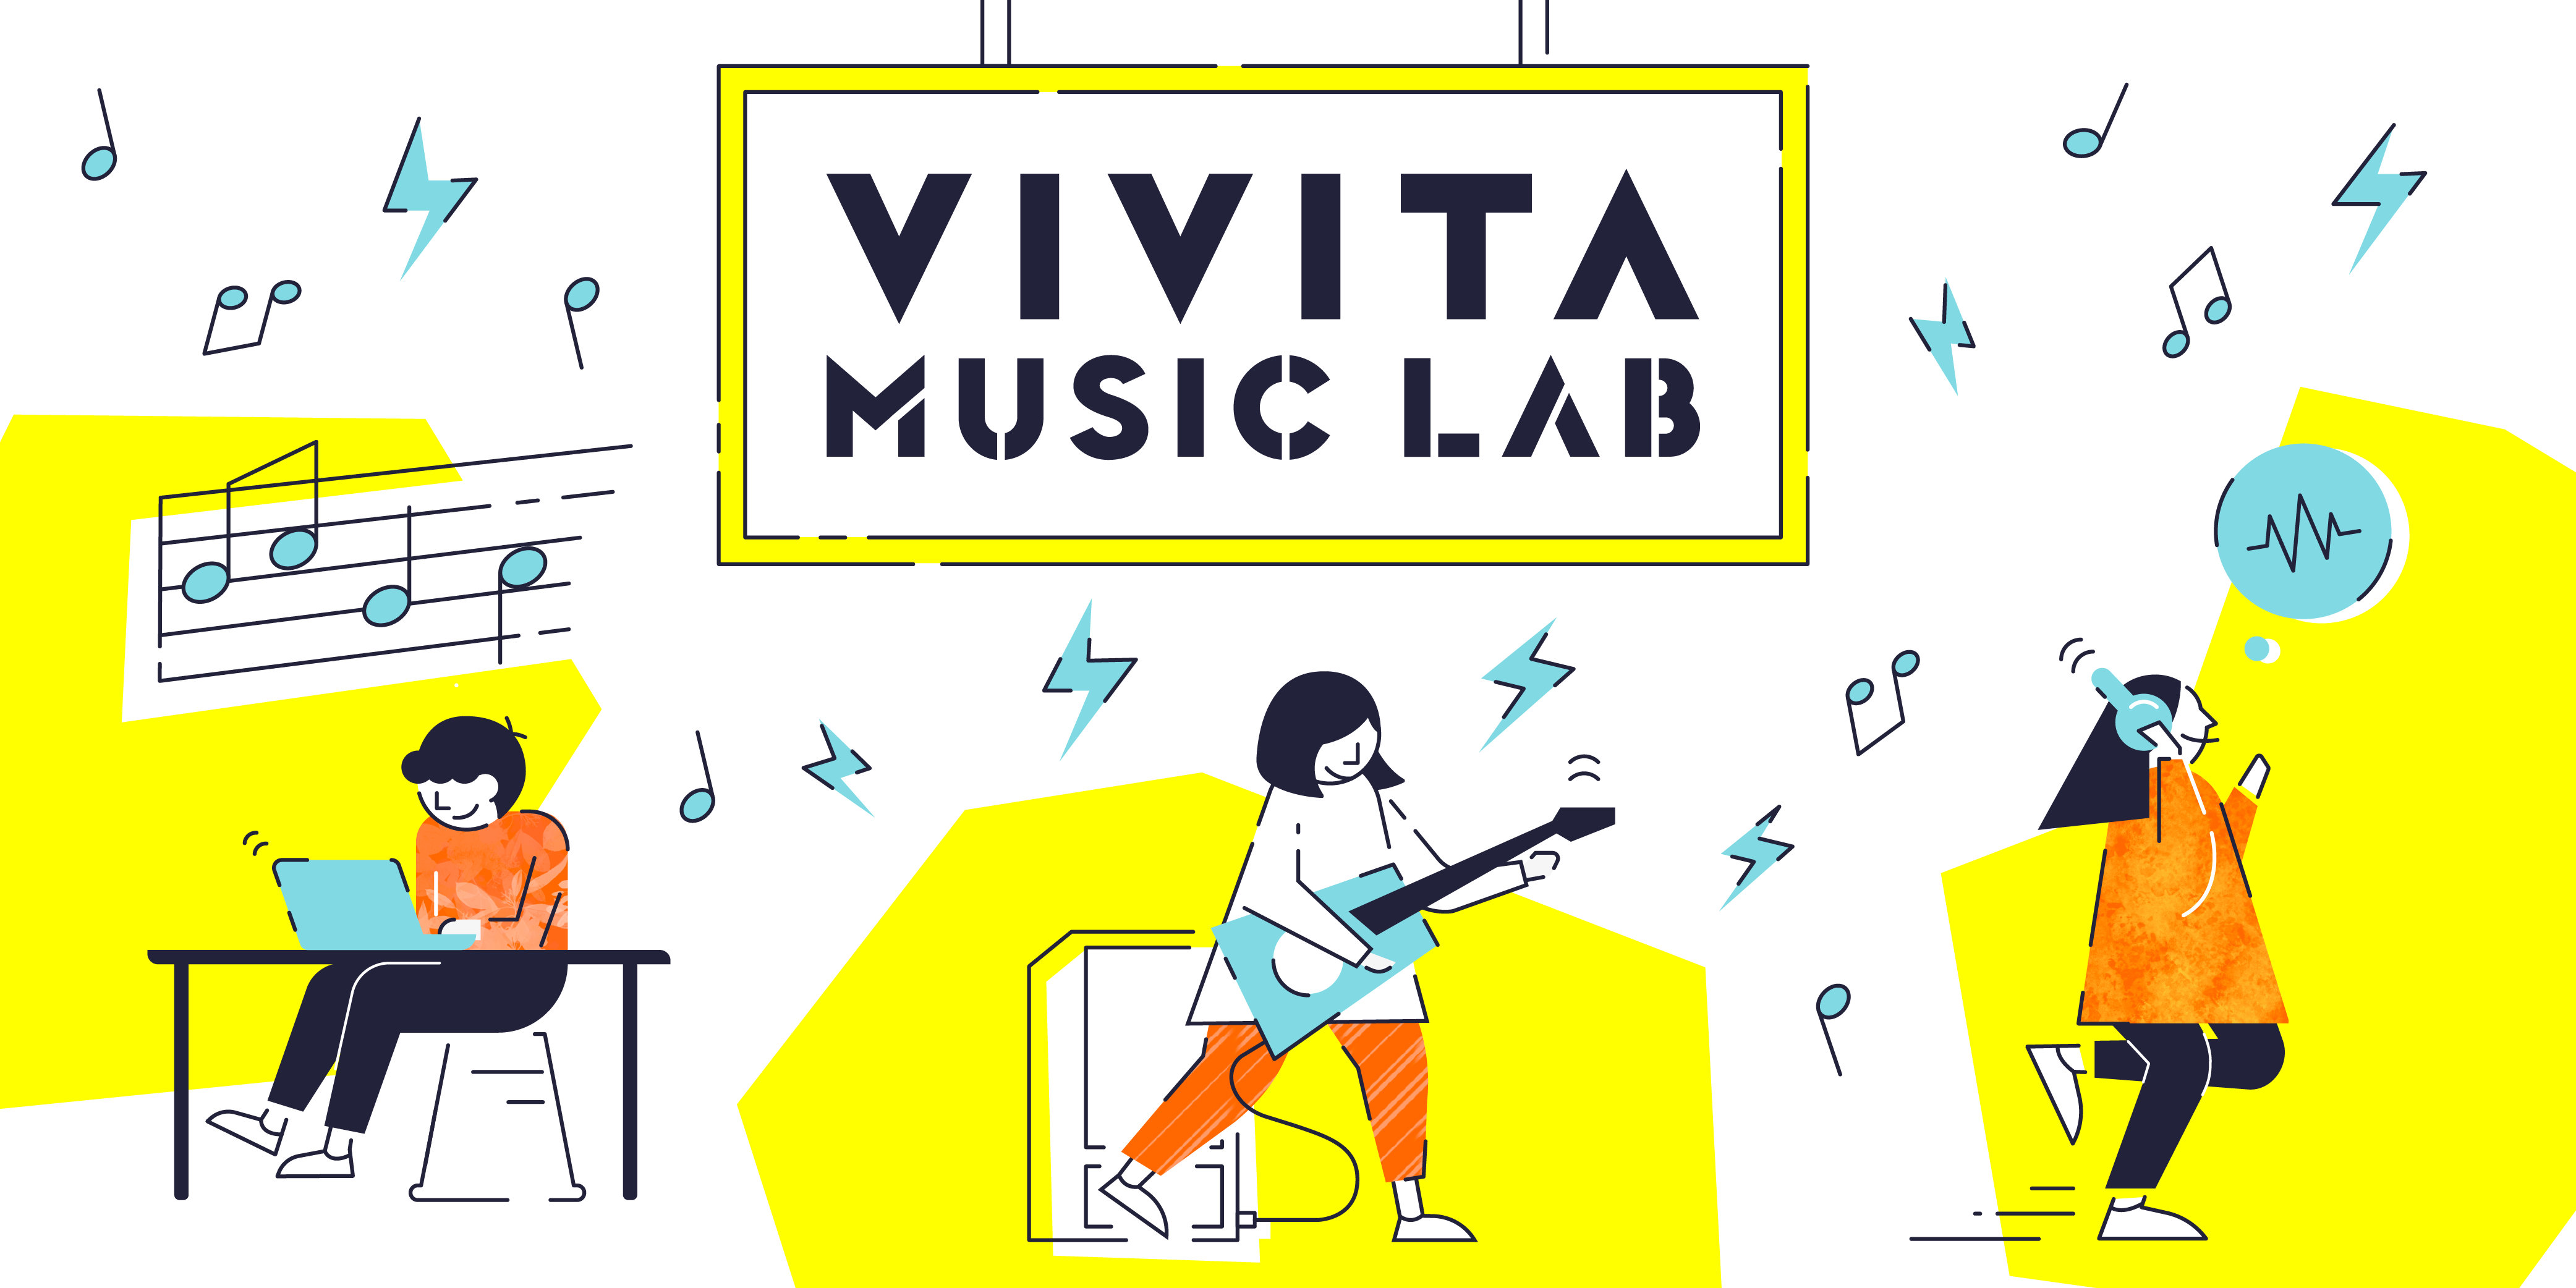 VIVITA Music Lab : ジャムセッションをしよう!